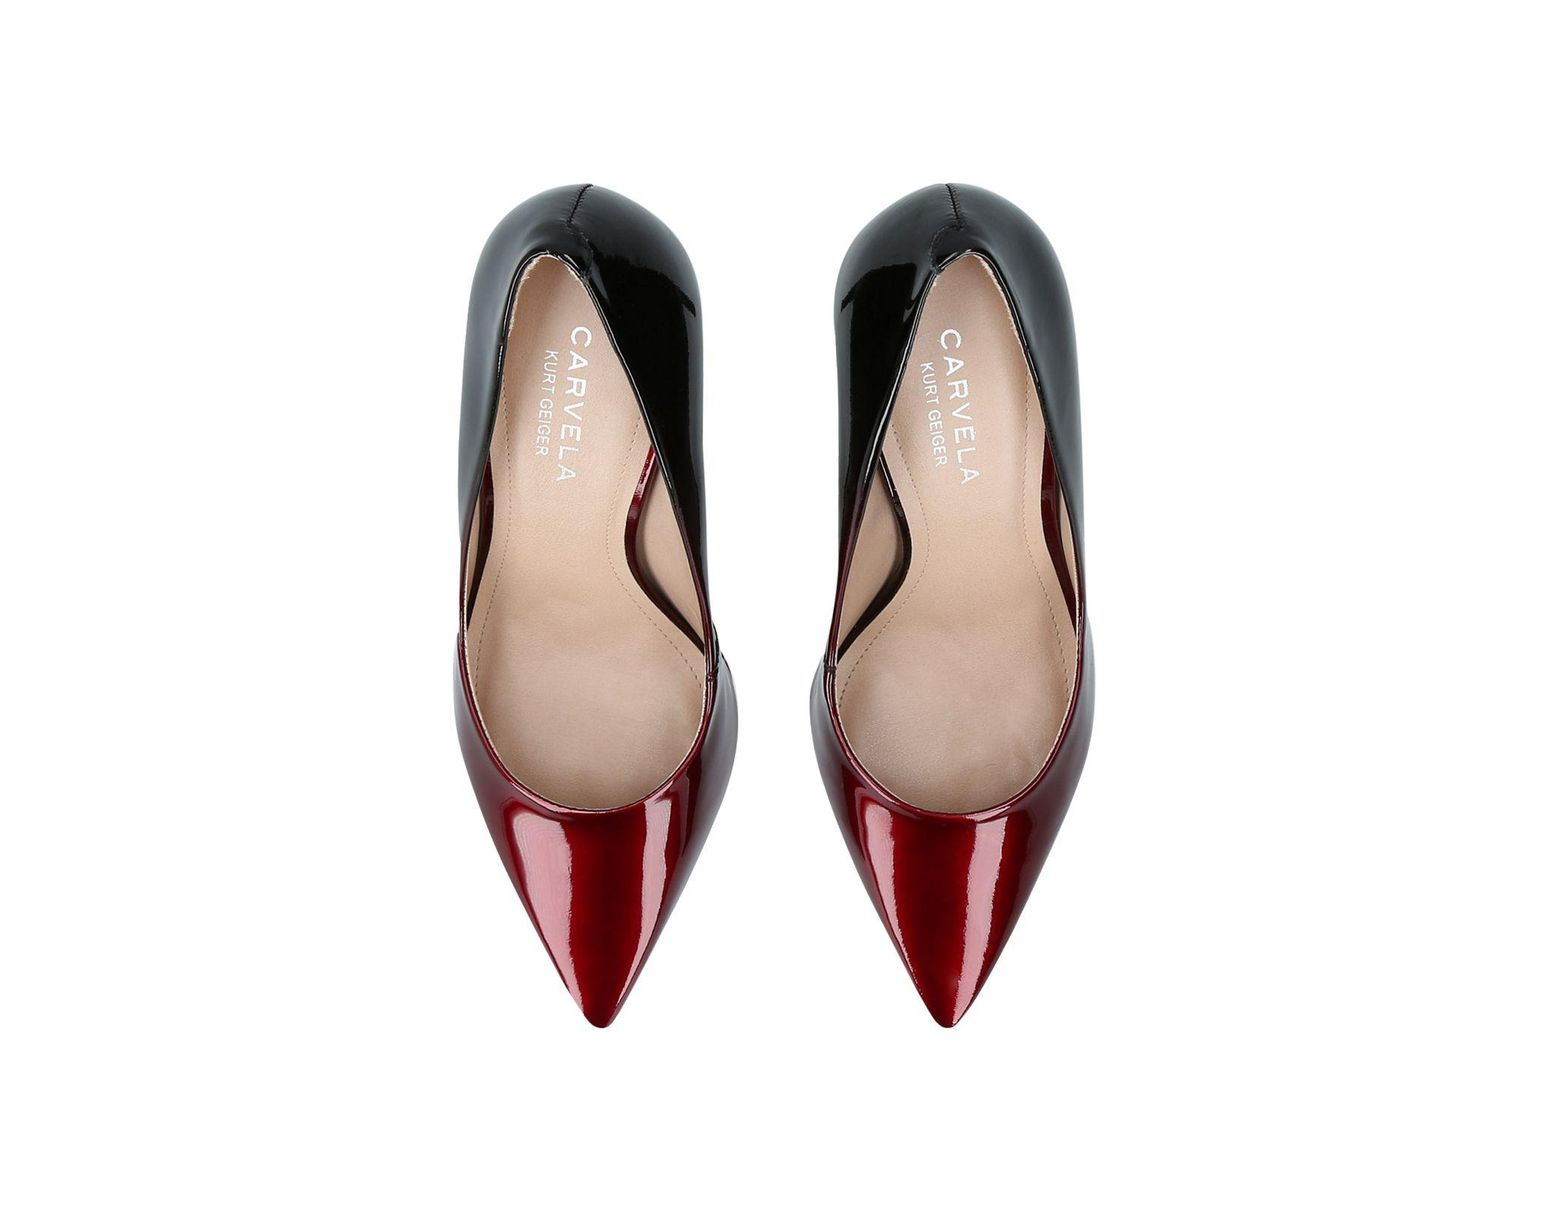 cc7da97702f Women's Red Alison Mid Heel Court Shoes